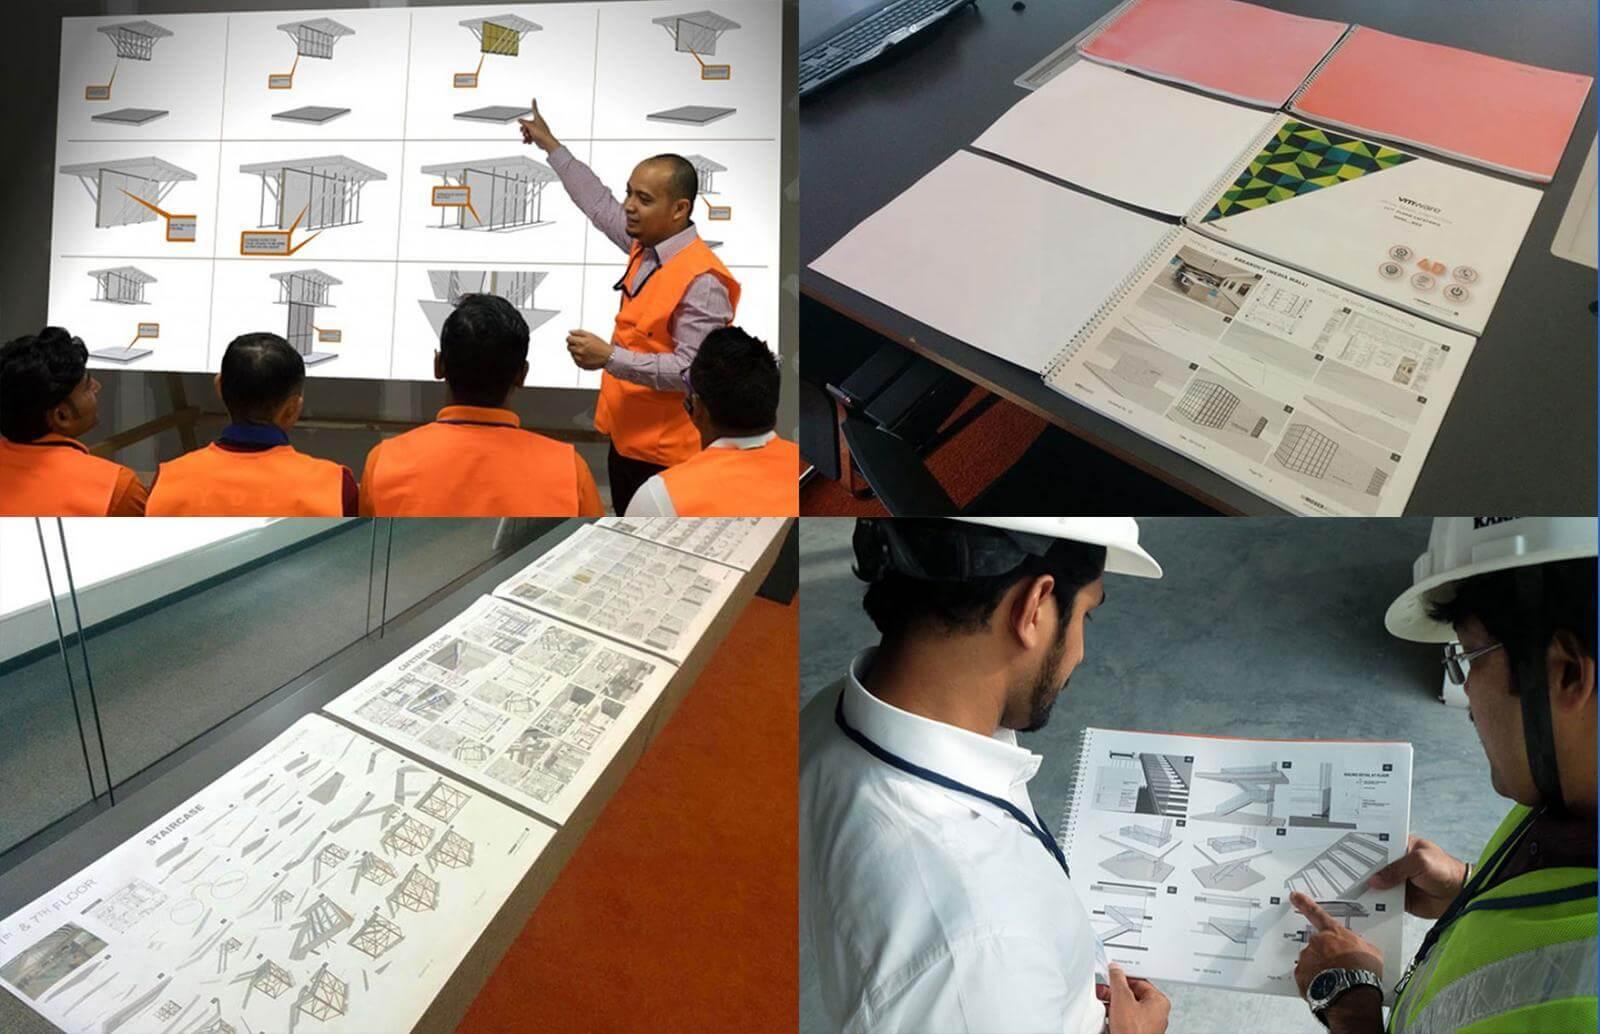 Produção industrial na construção virtual